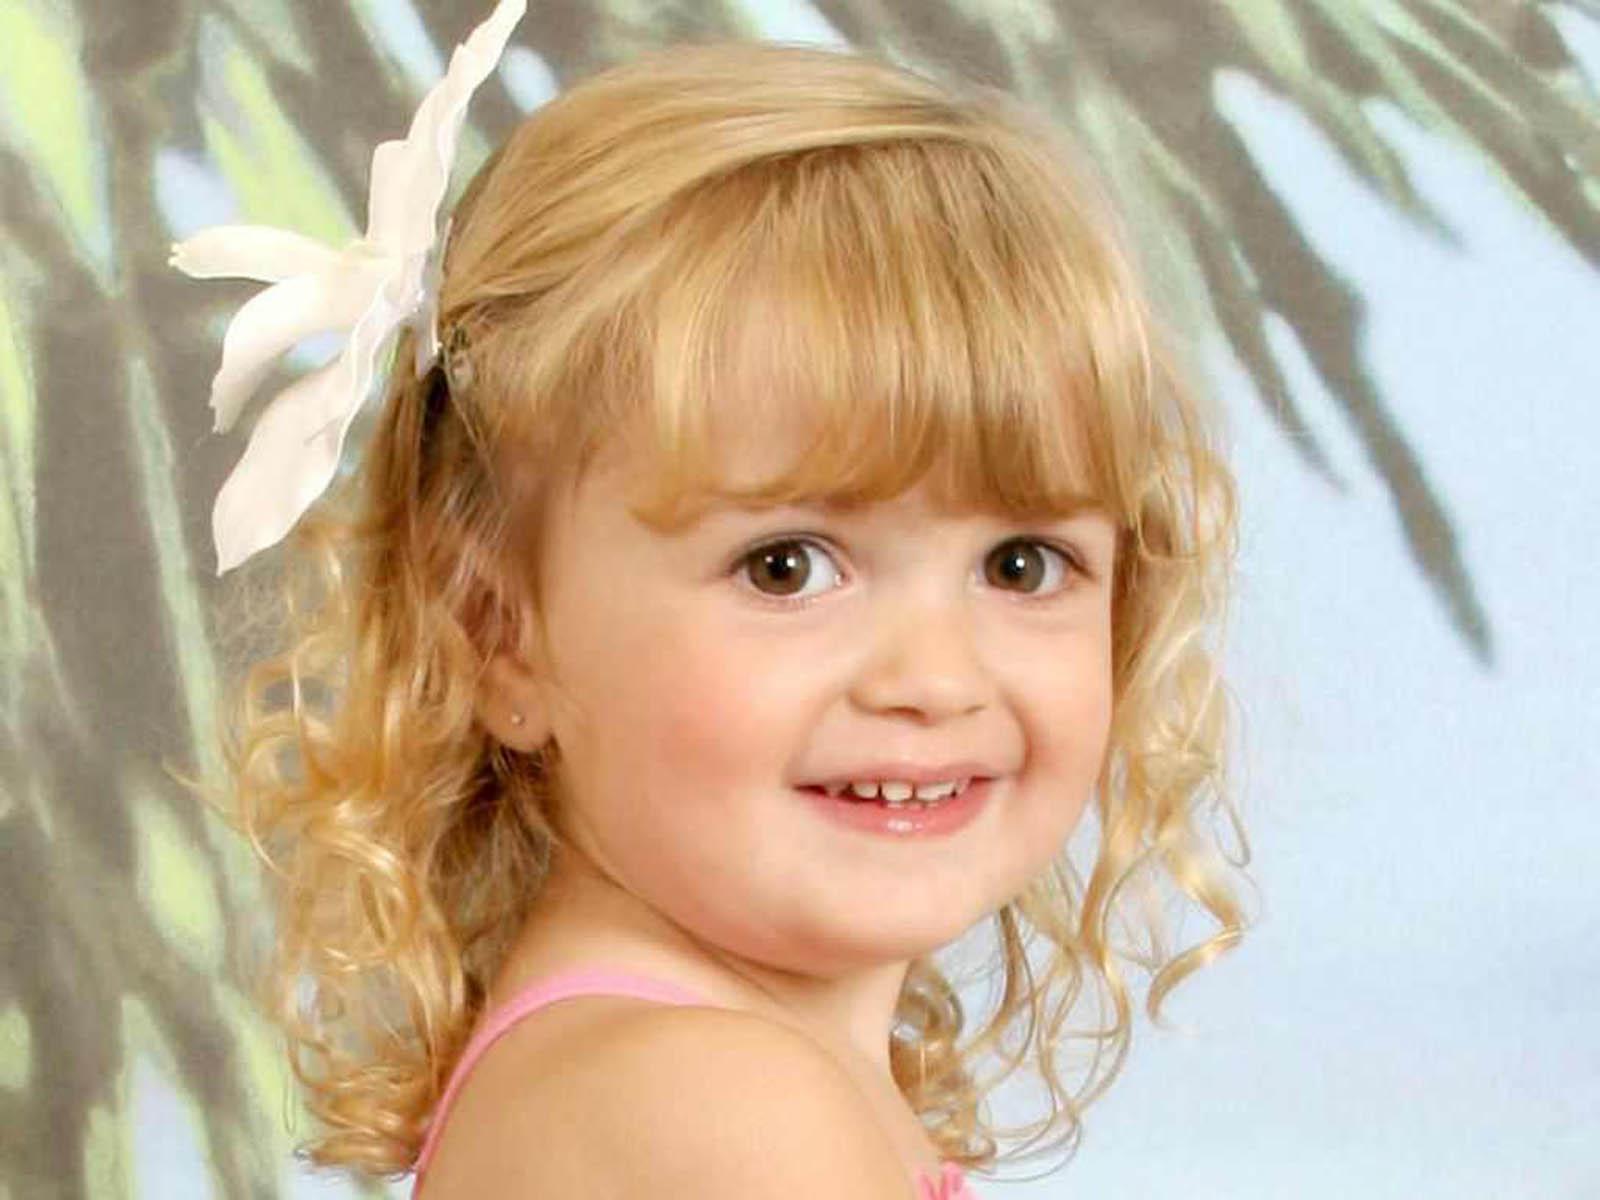 http://1.bp.blogspot.com/-hJApbJHEDvw/UOWiSLQAq-I/AAAAAAAAQis/ZyMjPbL2J-M/s1600/Innocent+Babies+Wallpapers.jpg